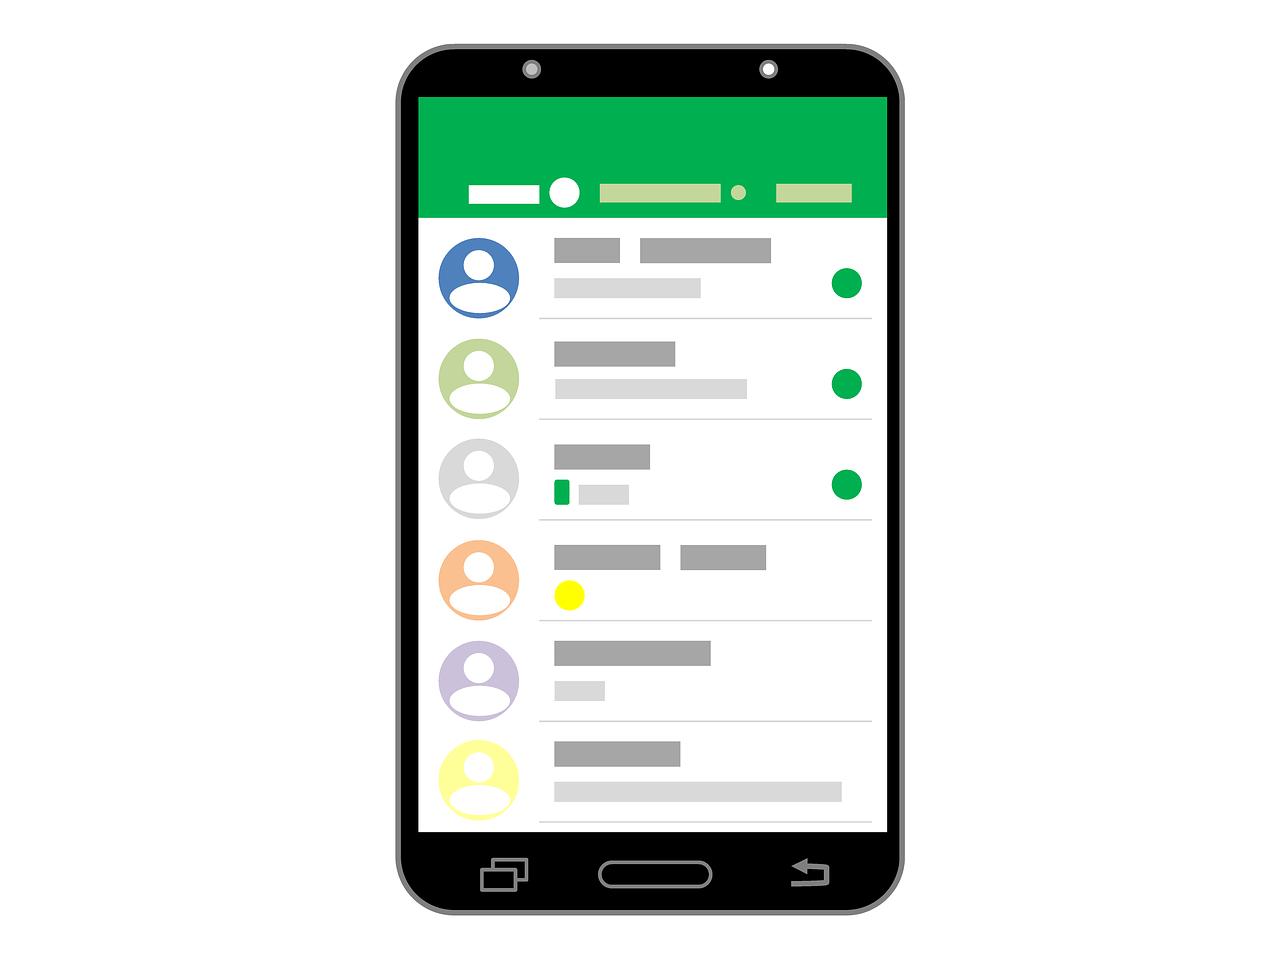 whatsapp, chat, message